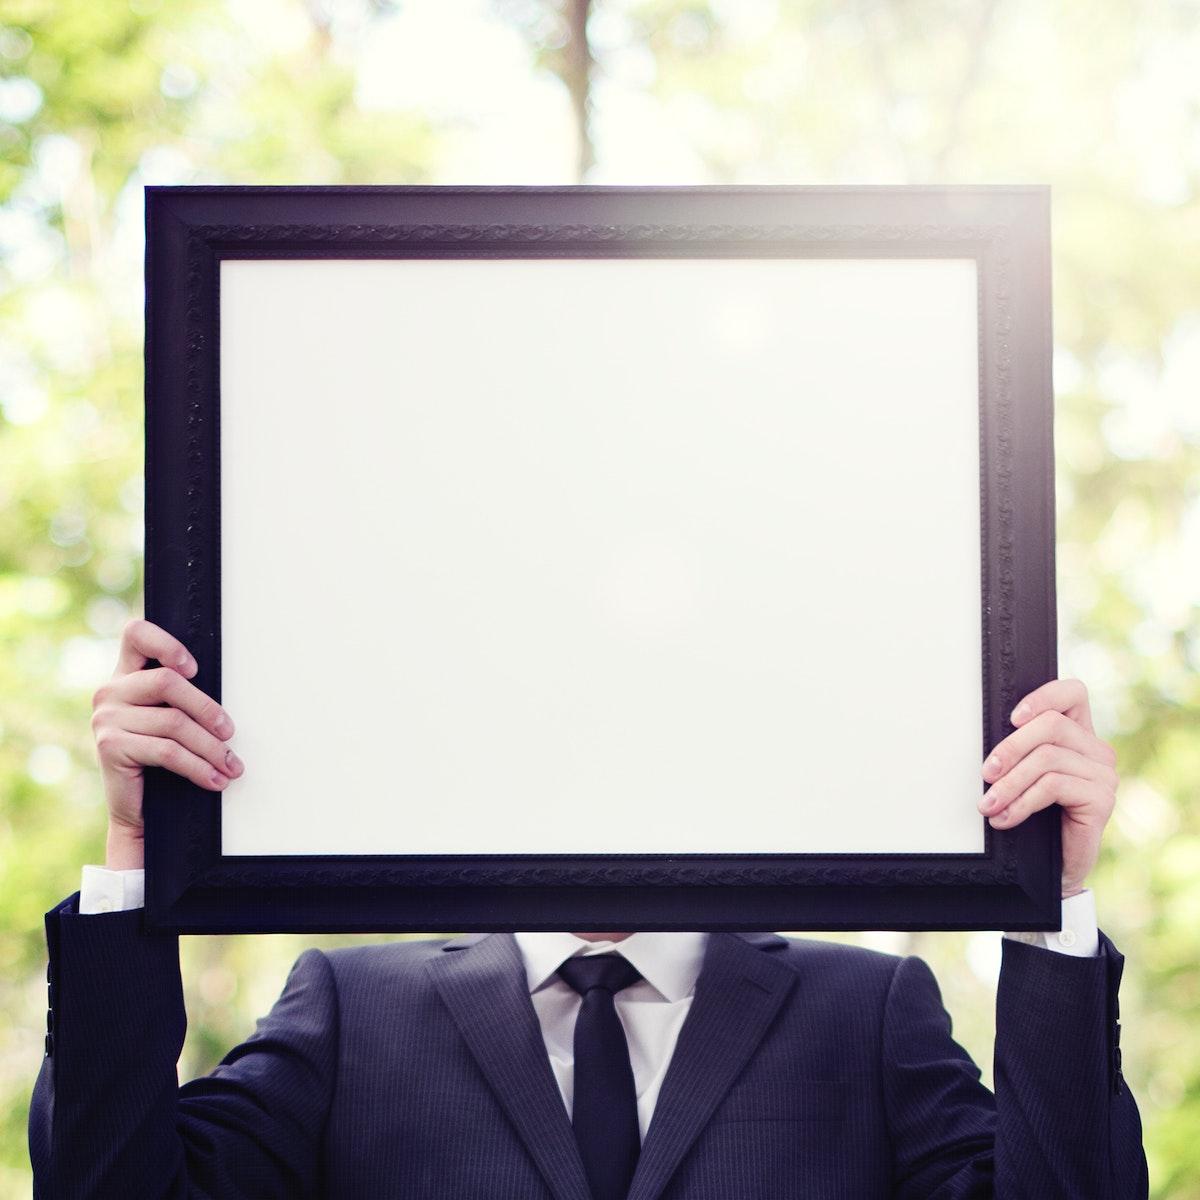 Businessman outdoors holding an empty placard